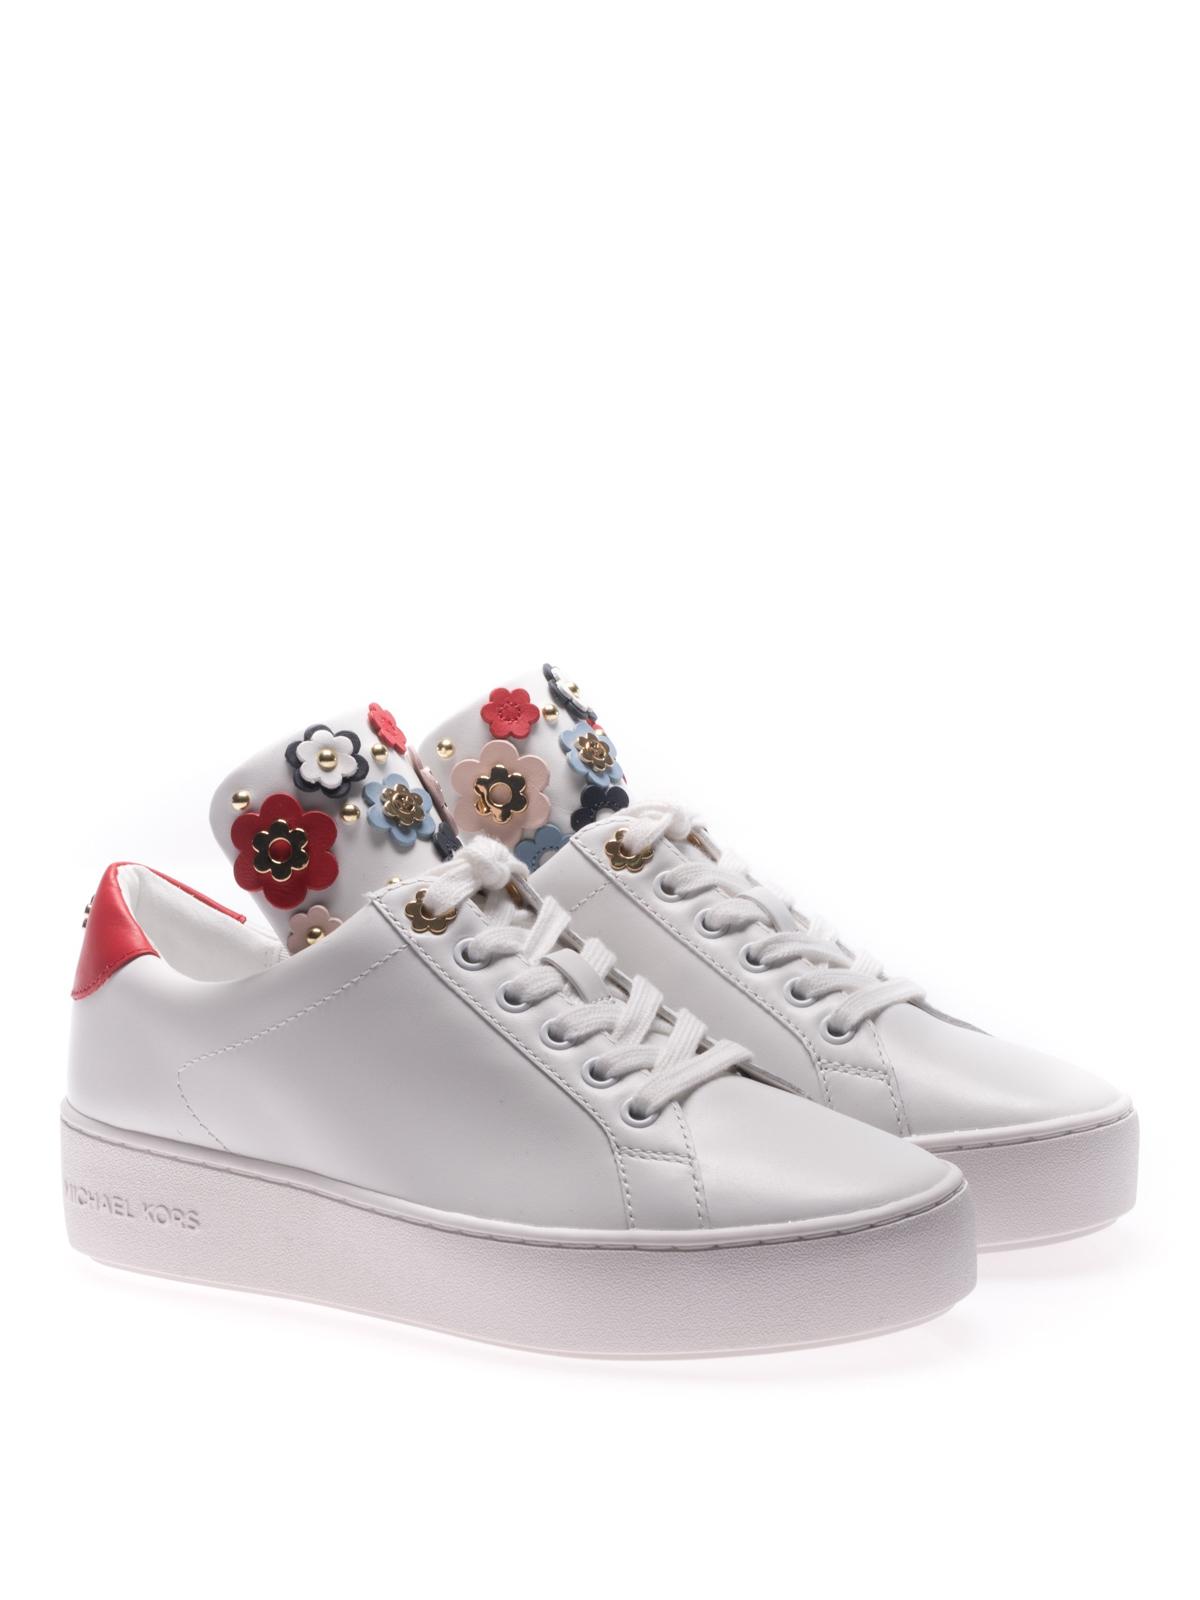 Sneaker Pelle In Decorata Mindy Michael Sneakers Kors kiXPuOZ